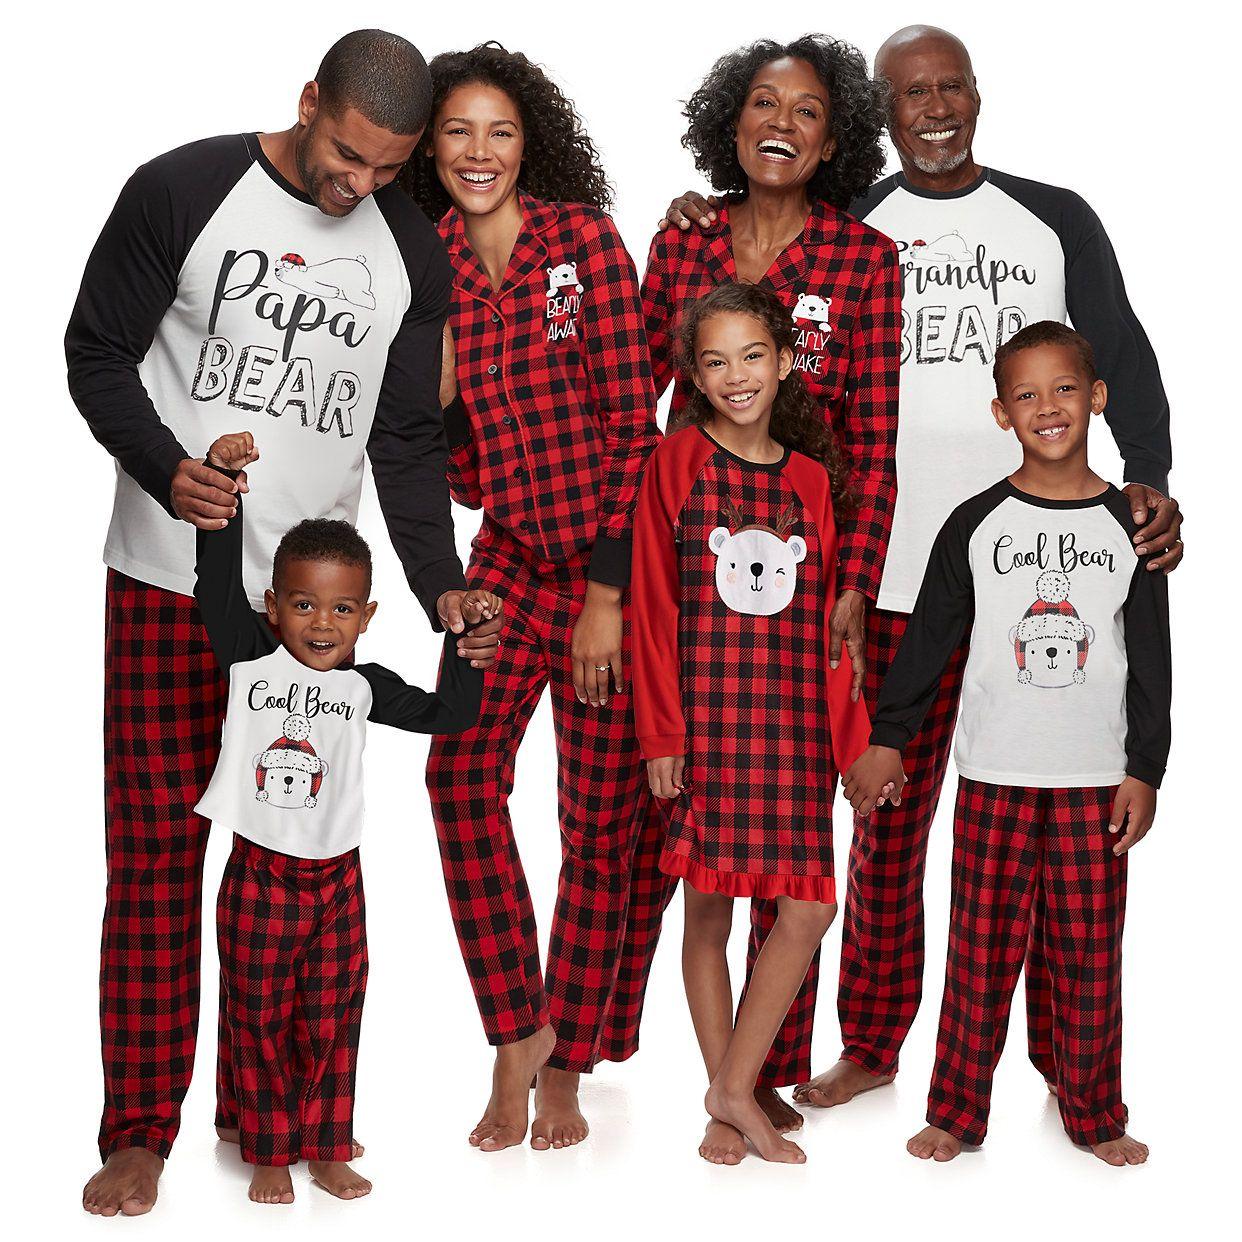 Men Set Seasonal PJs Adult Christmas Jammies Kids Women Holiday Family Matching Pajamas Red Nordic